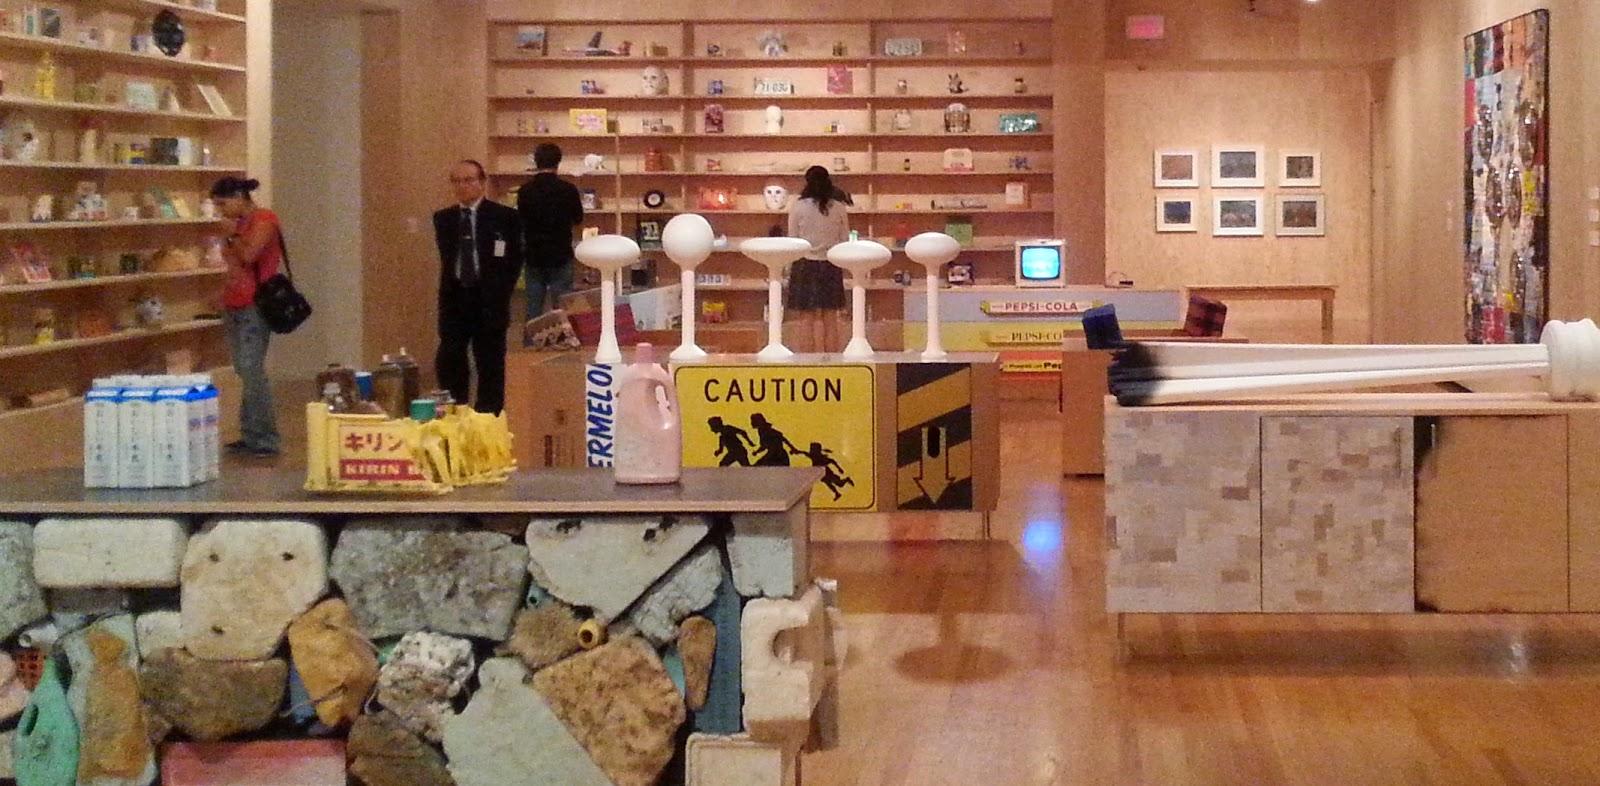 vivian in stitches douglas coupland vancouver art gallery